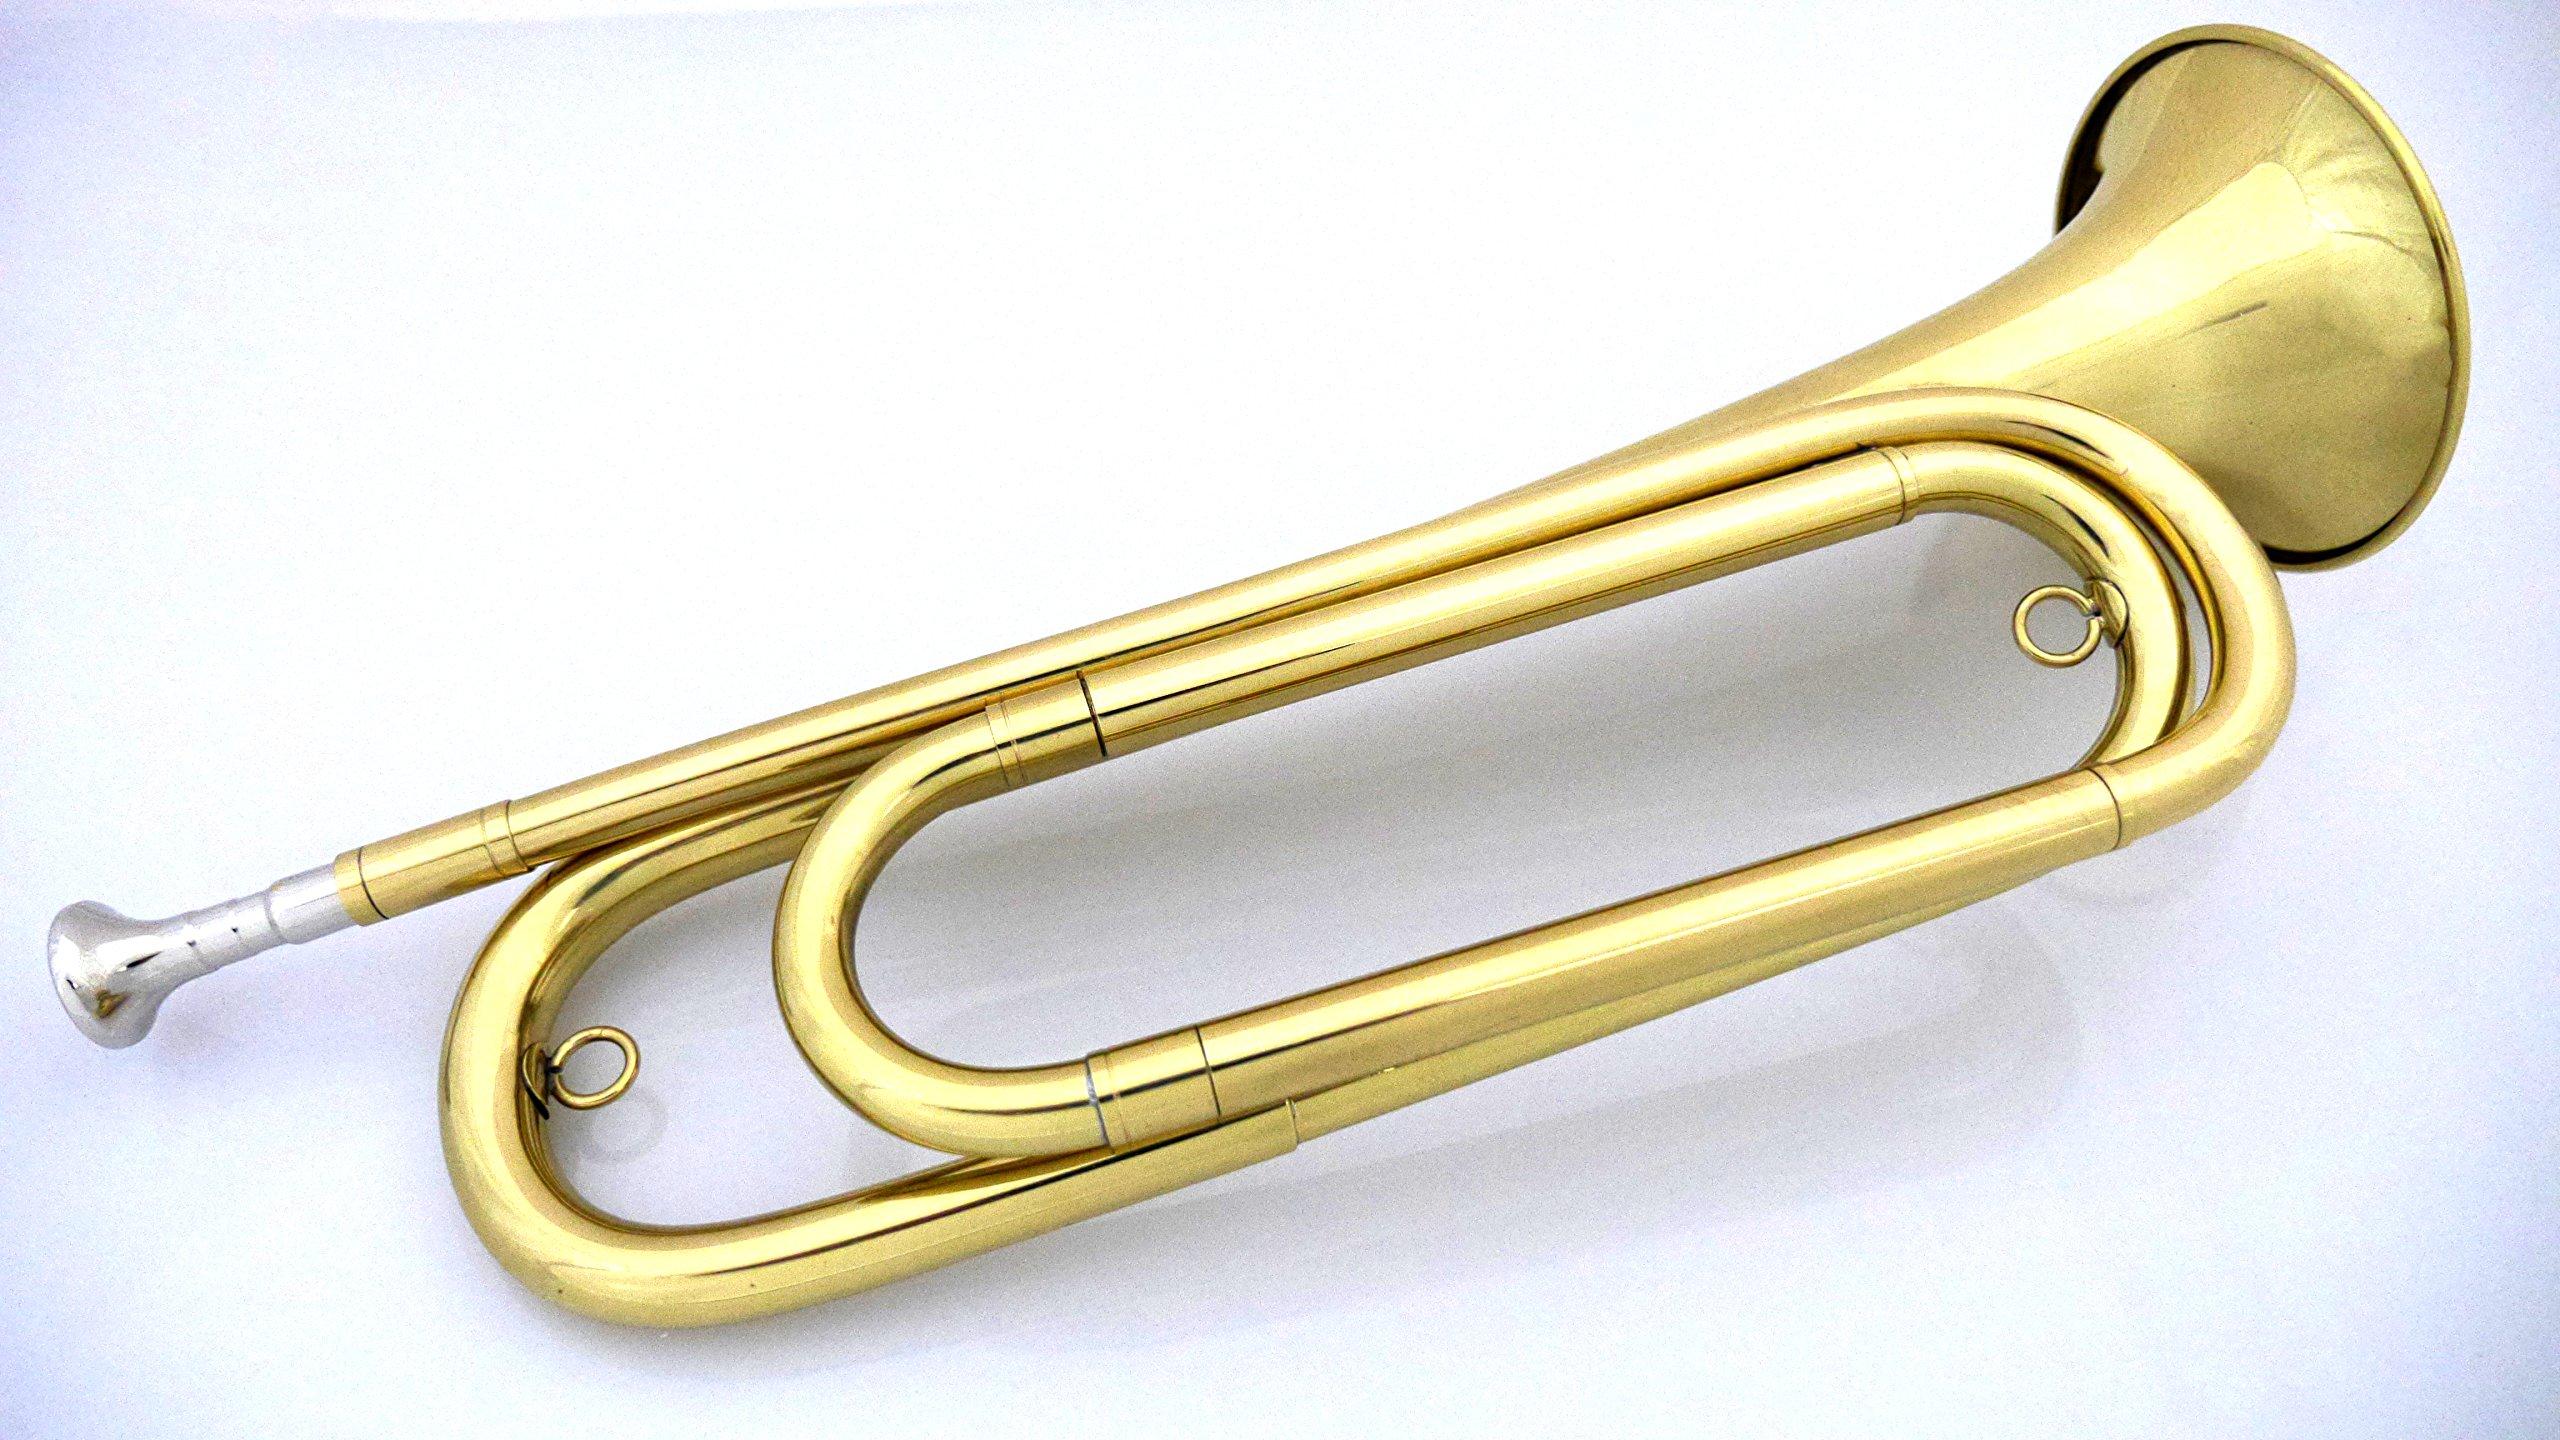 U.S. Regulation Bugle Brass Lacquer w/Mouthpiece and Bag by U.S. Regulation Bugle